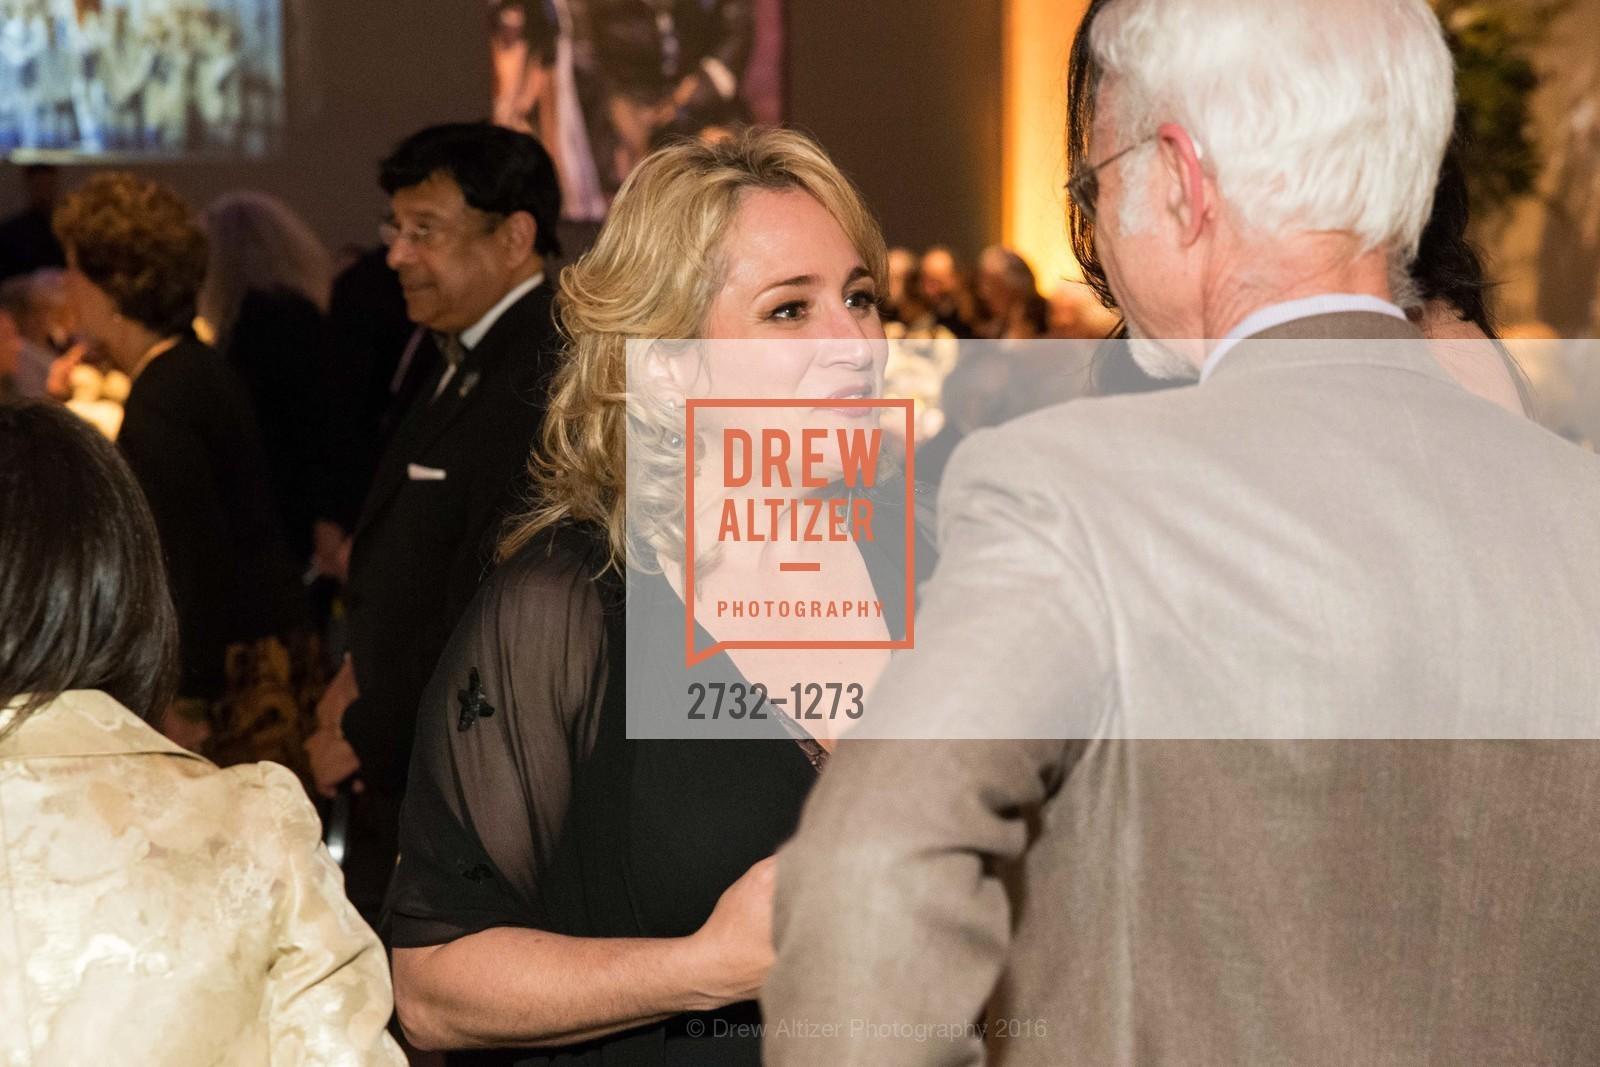 Patricia Racette, Photo #2732-1273